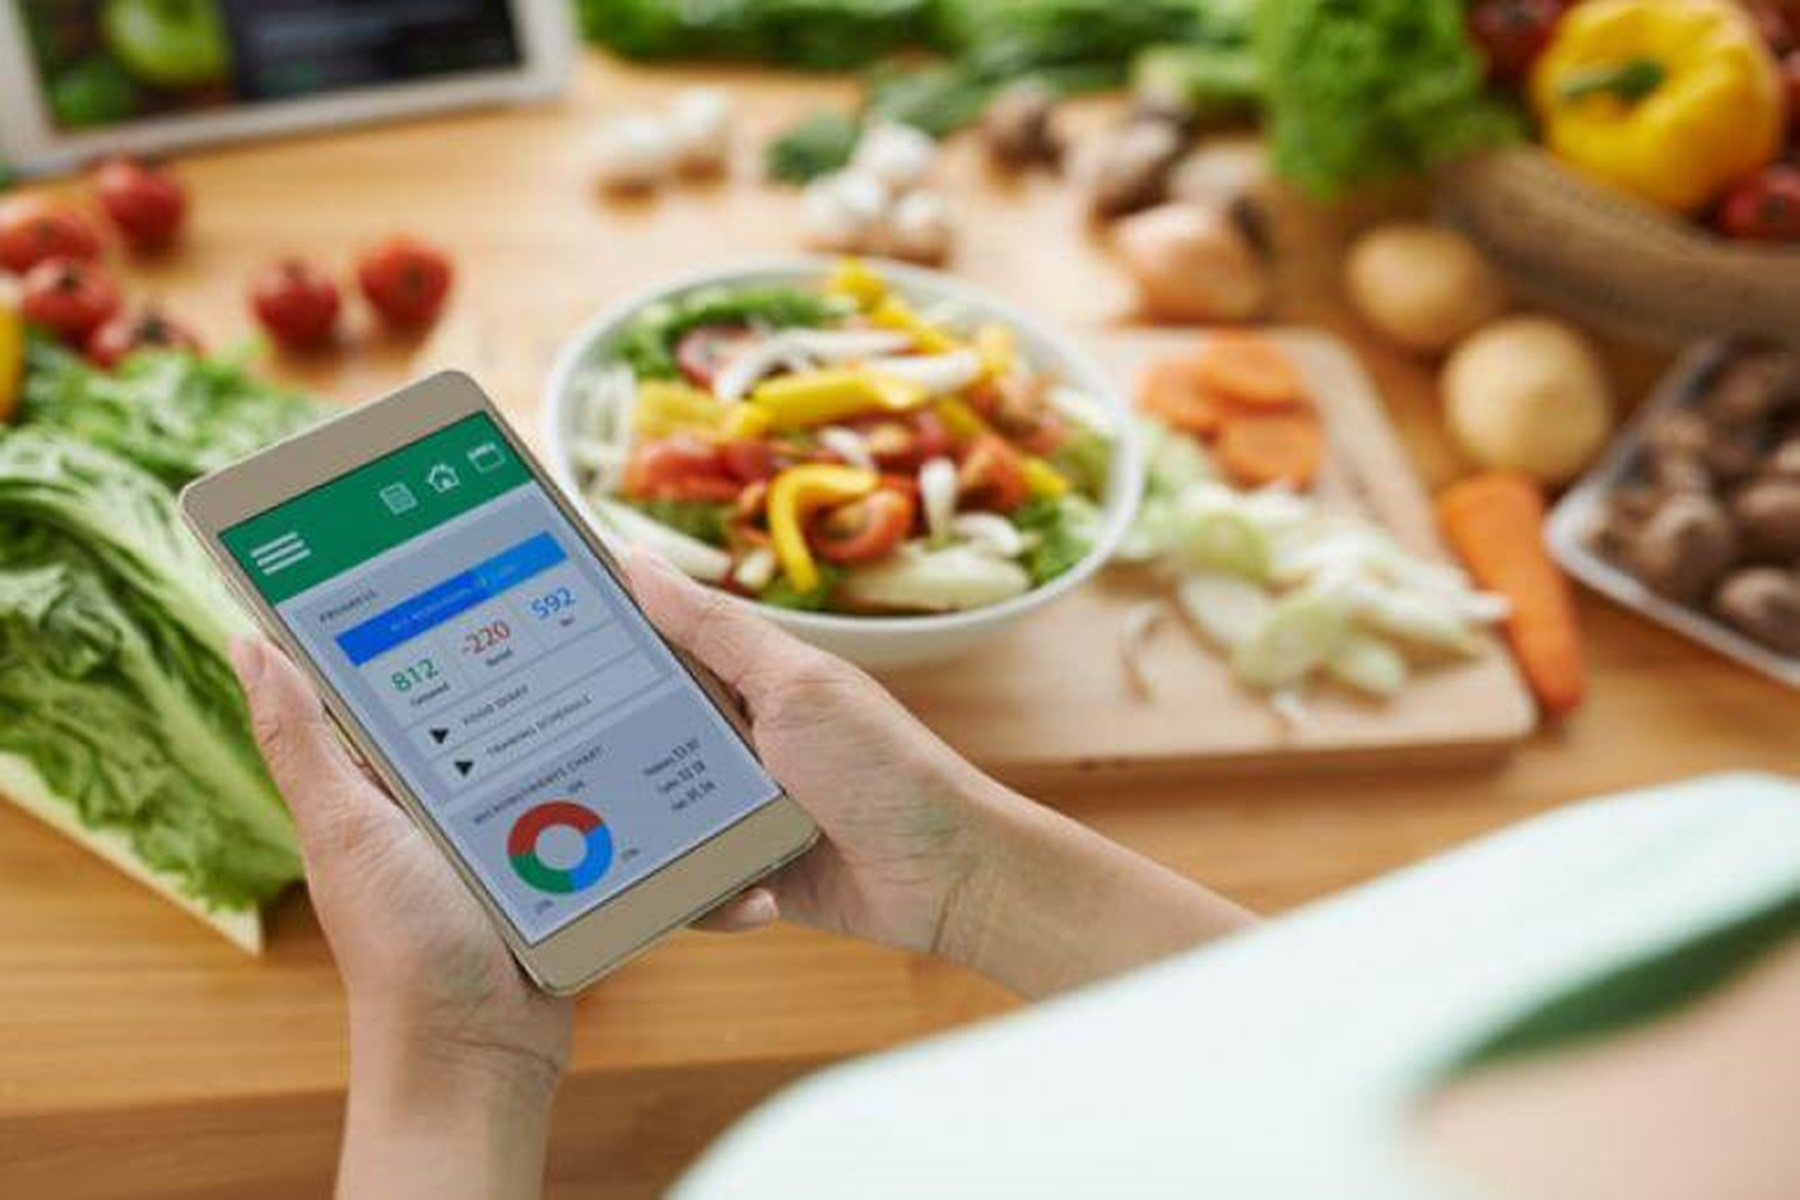 Google : Δημιουργεί εφαρμογή που μετράει θερμίδες φαγητού μέσω εικόνας